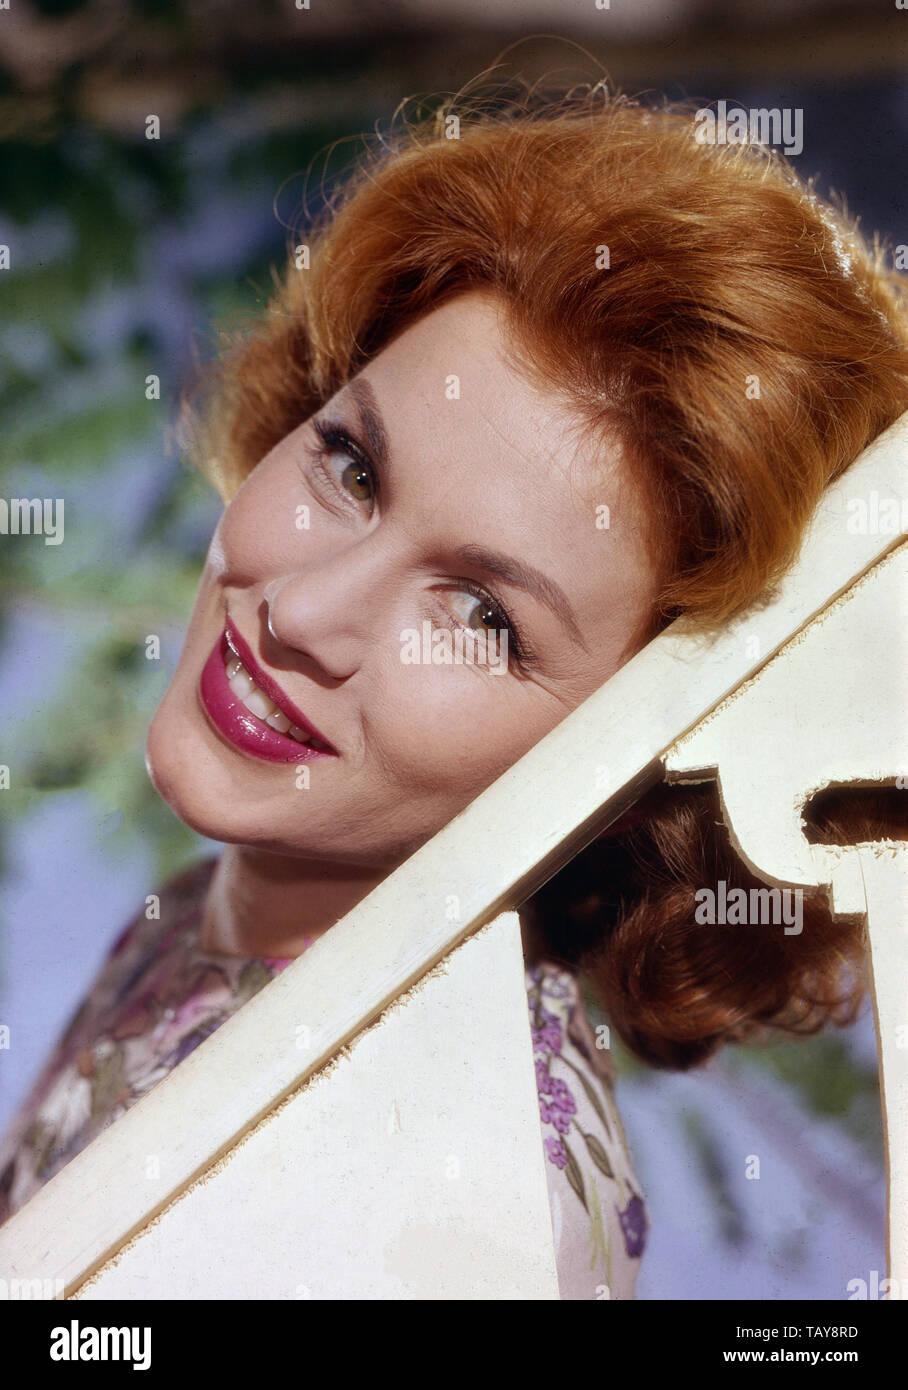 Linda Christian, mexikanisch-amerikanische Schauspielerin, Deutschland 1950er Jahre. Mexican American actress Linda Christian, Germany 1950s. - Stock Image